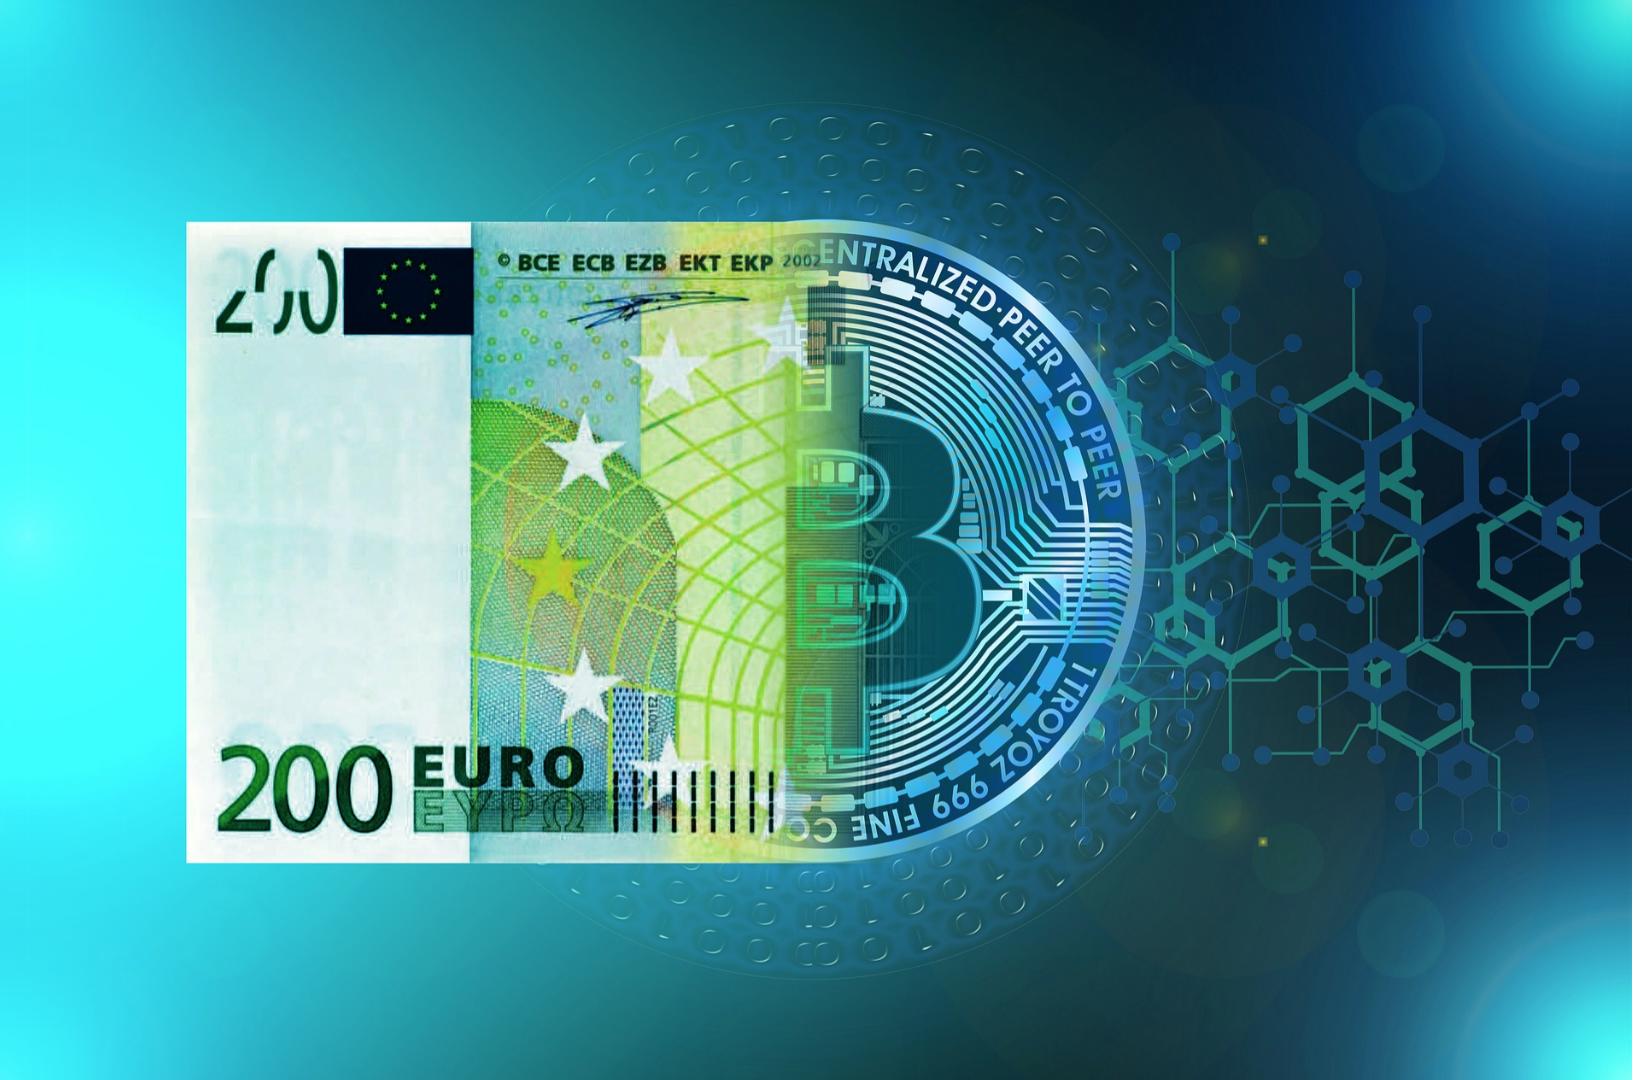 Digitale euro ecb